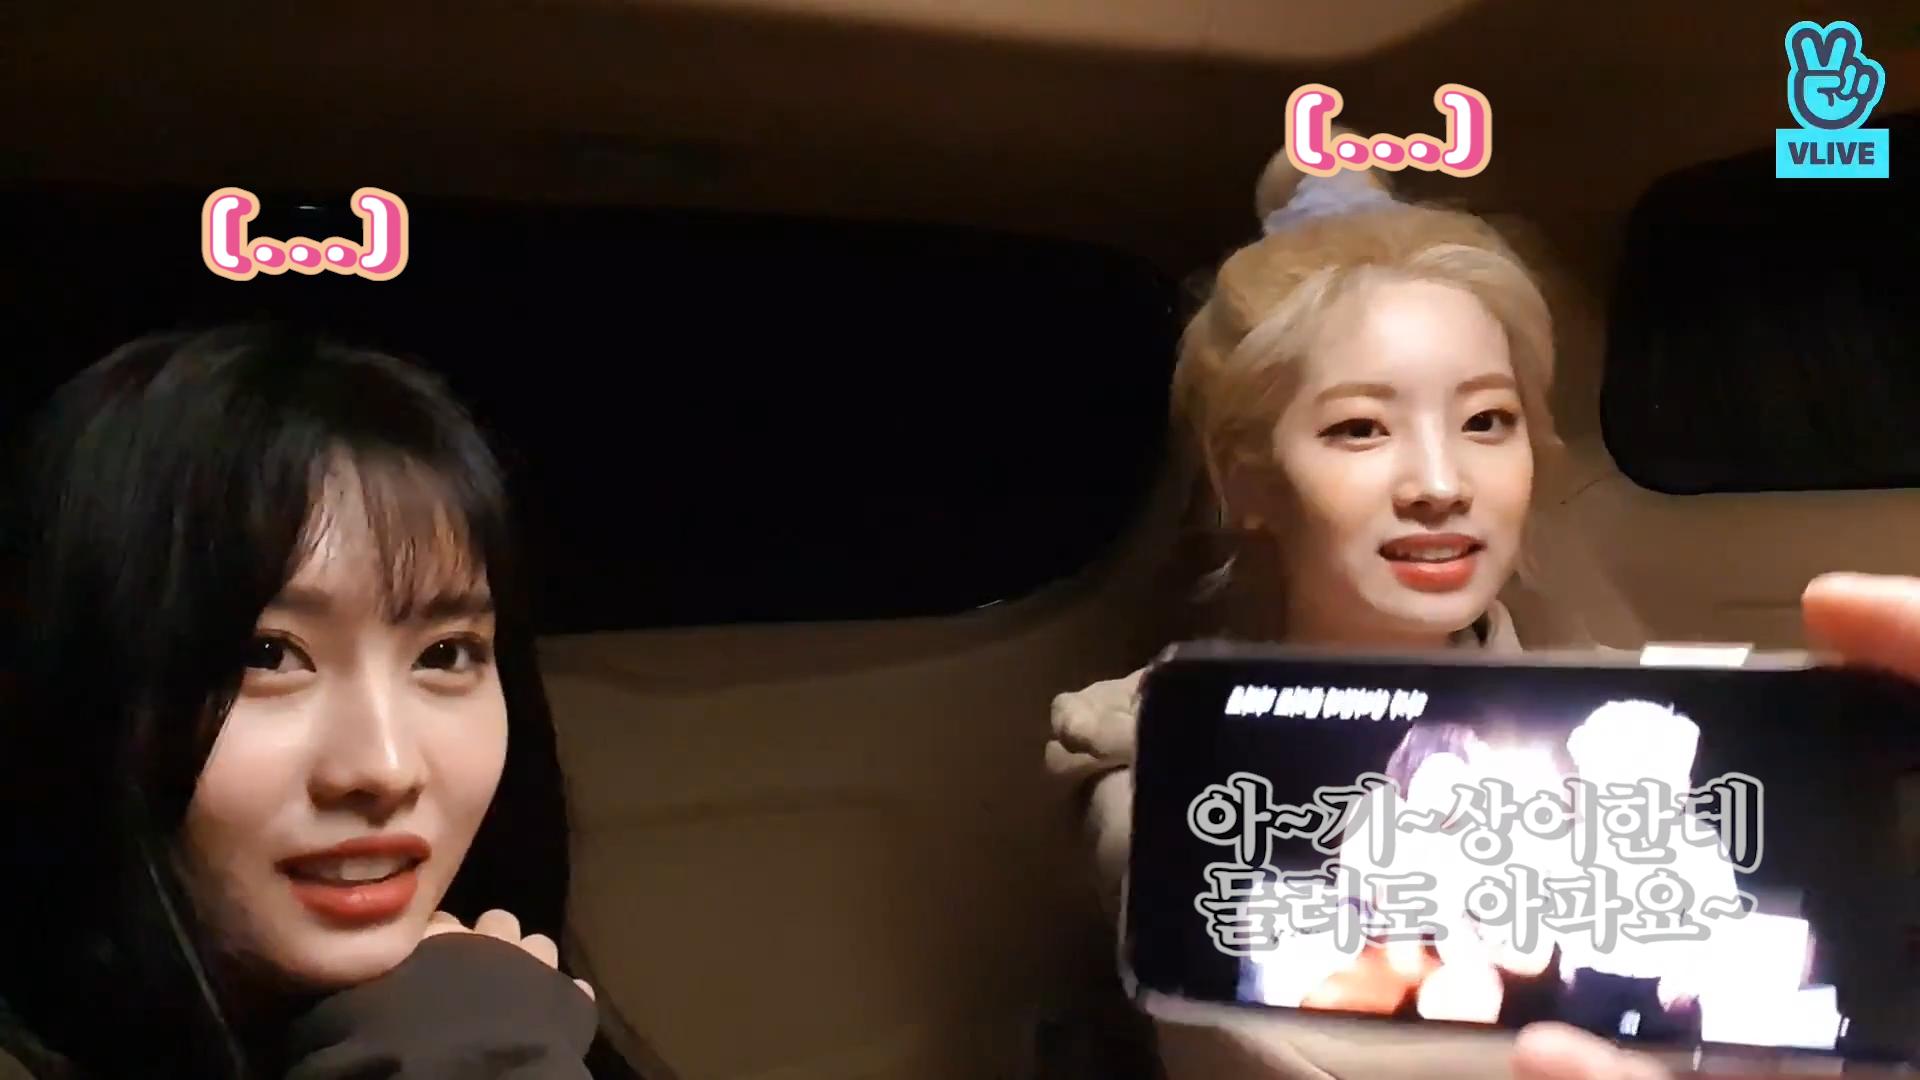 [TWICE] 아기상어한테 물리면 아프고 울와한테 빠지면 어푸야💦 (Momo&Dahyun watching Jeongyeon's favorite video)